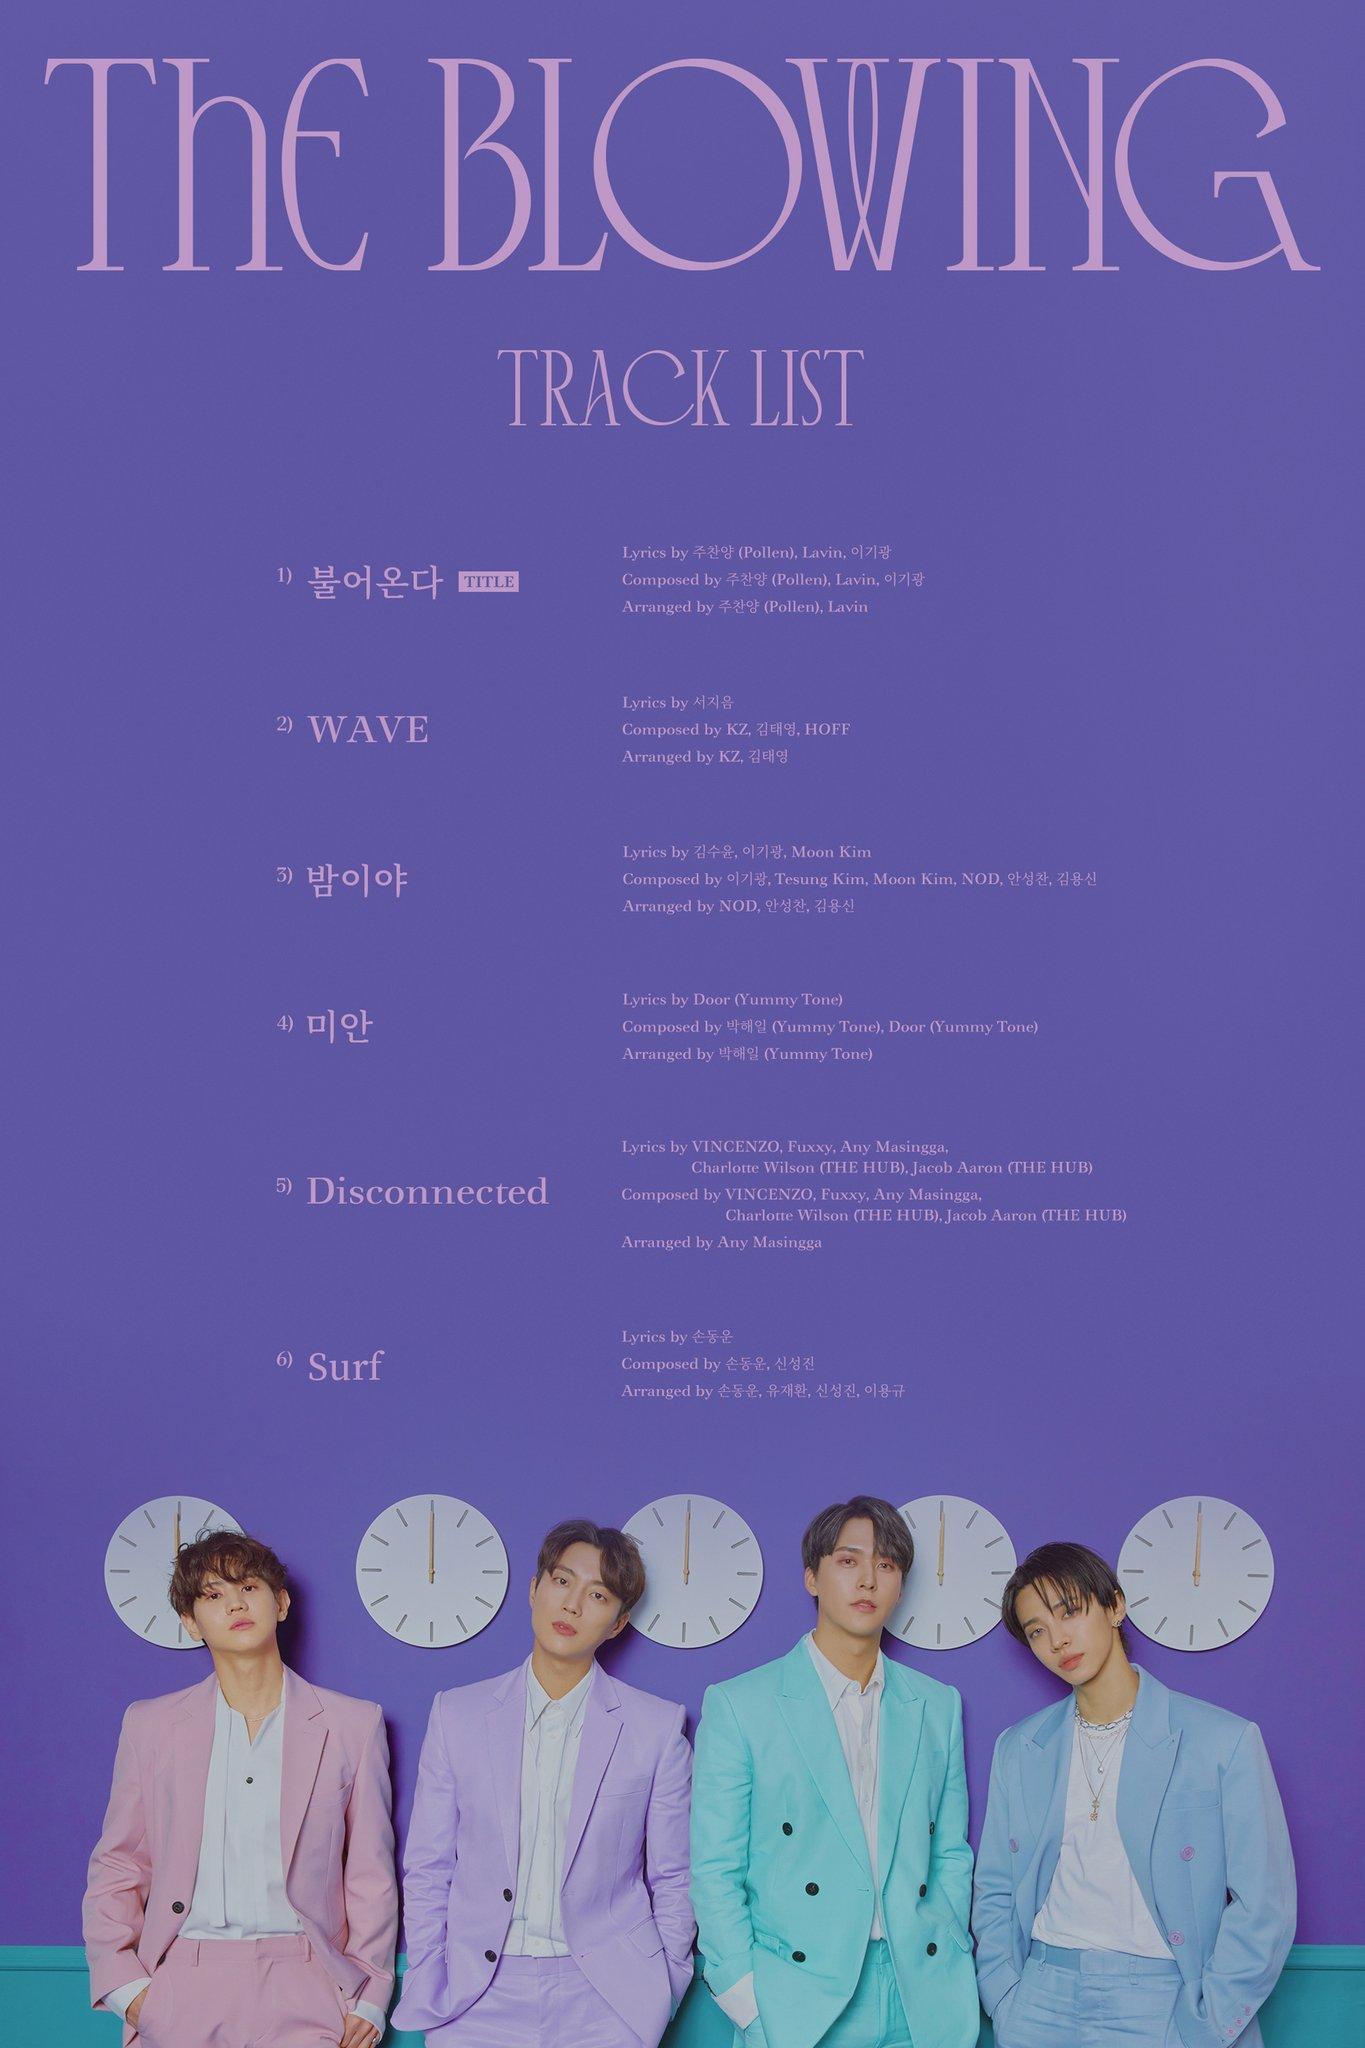 Highlight Track List